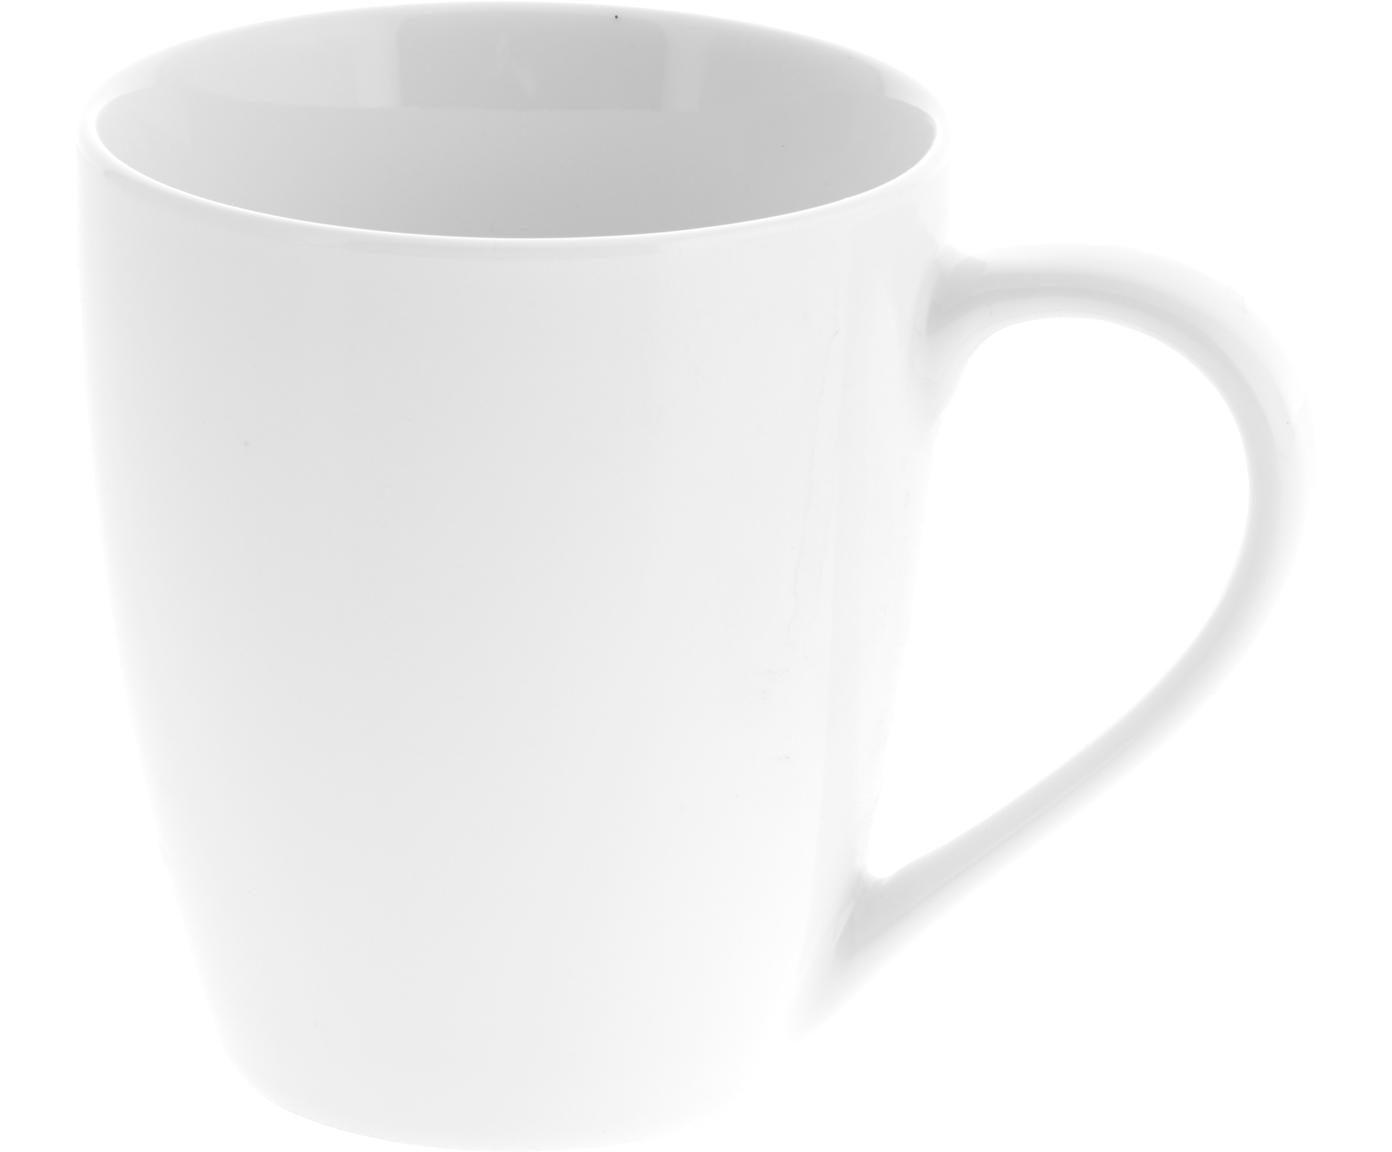 Kubek Delight, 2 szt., Porcelana, Biały, Ø 9 x W 10 cm